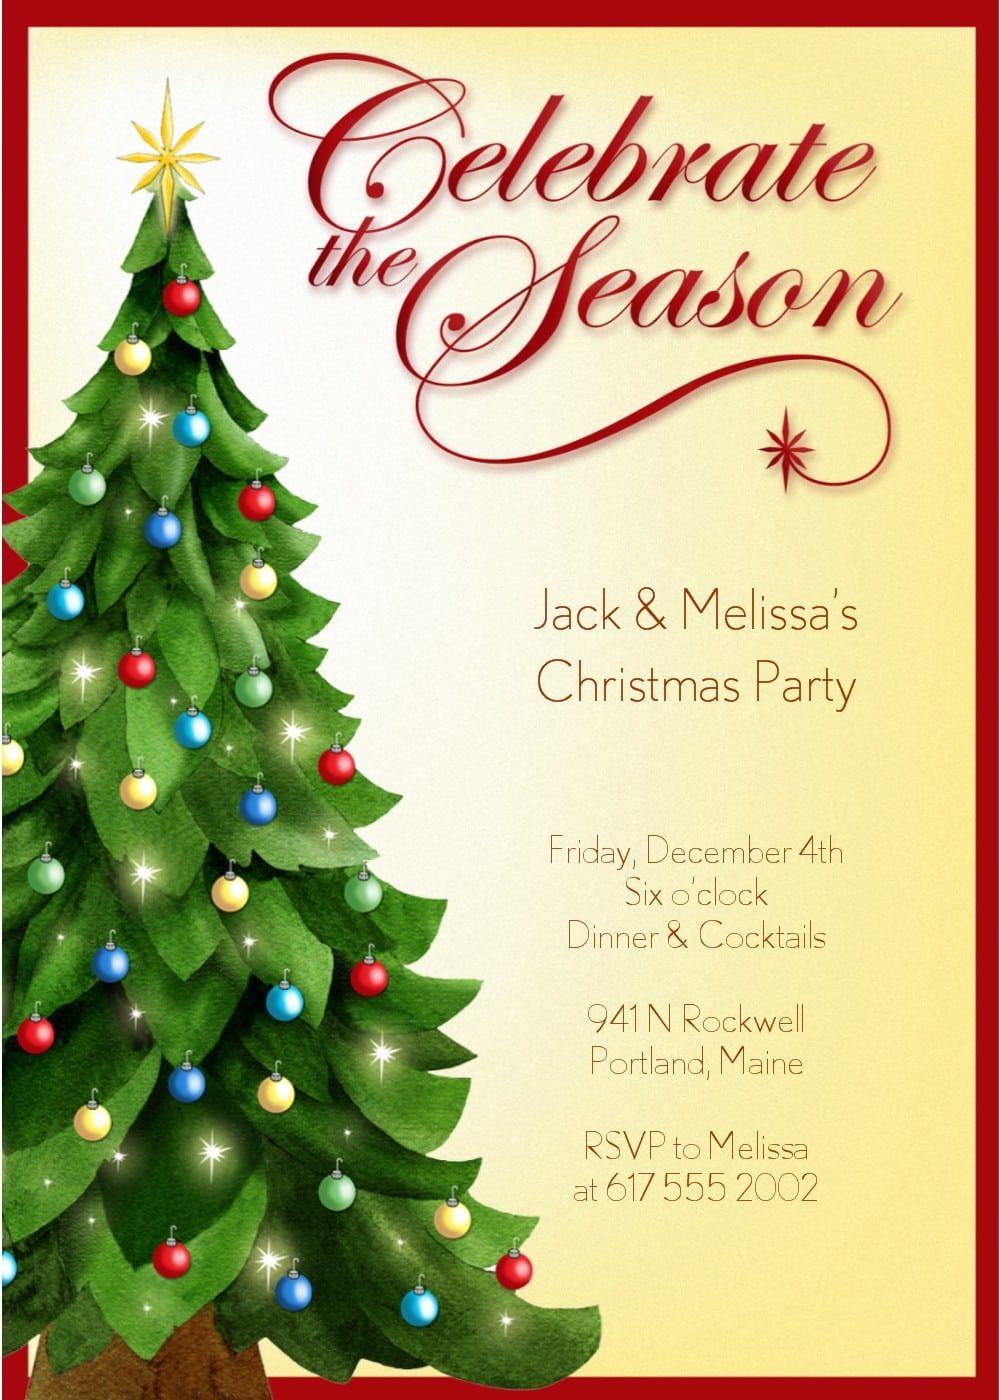 Sample Of Christmas Invitations Greetings Christmas Invitations Template Free Christmas Invitation Templates Christmas Invitation Card